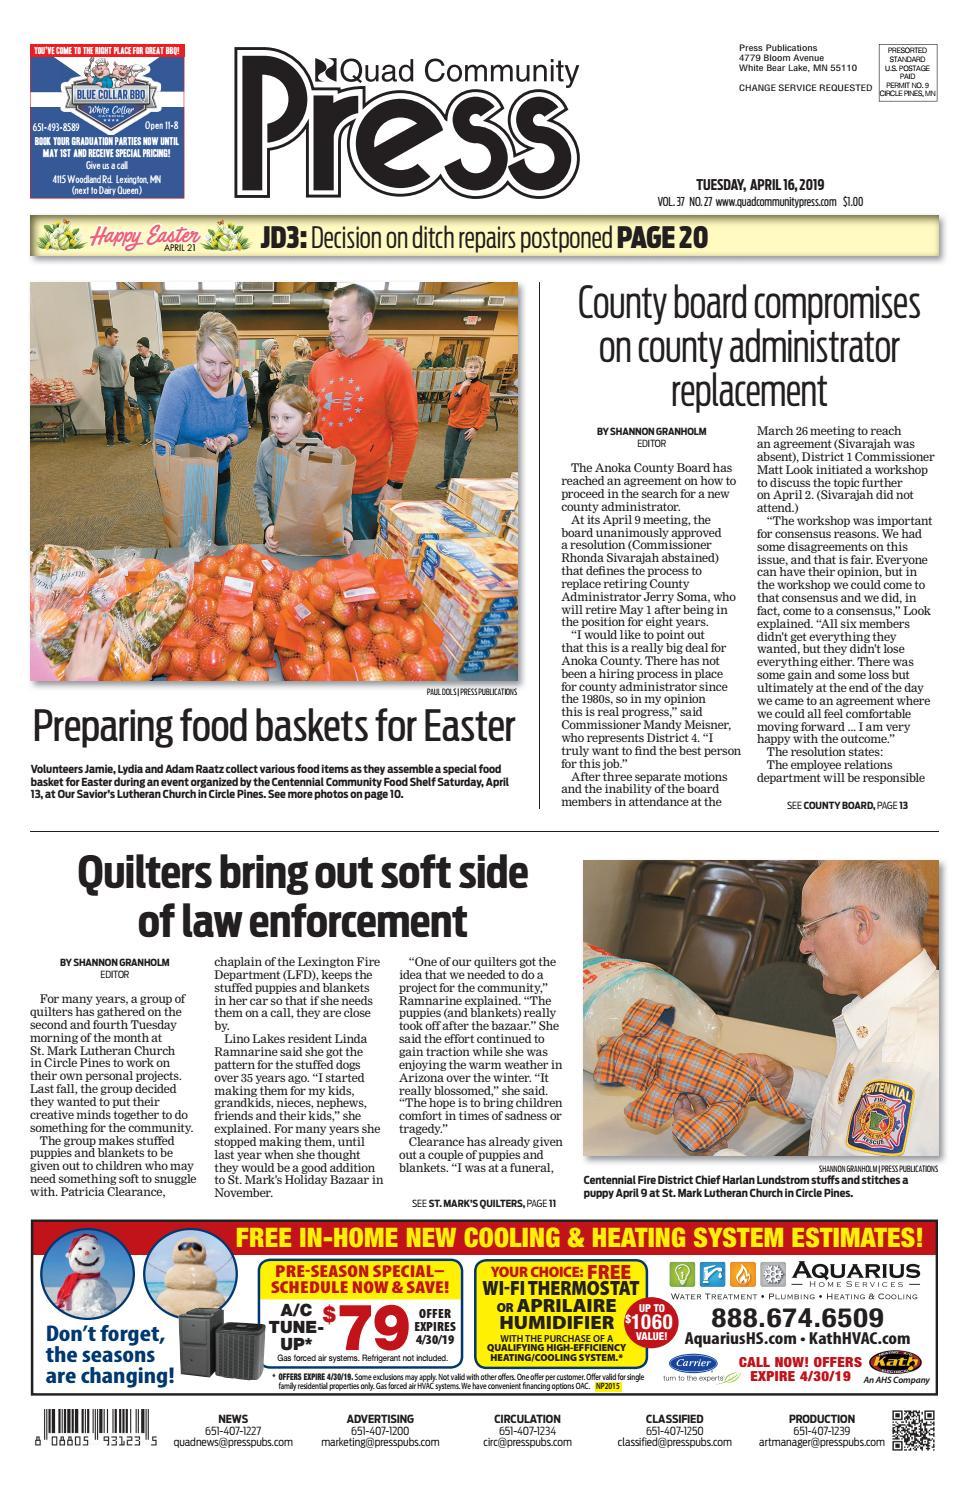 Quad Community Press by Press Publications - issuu